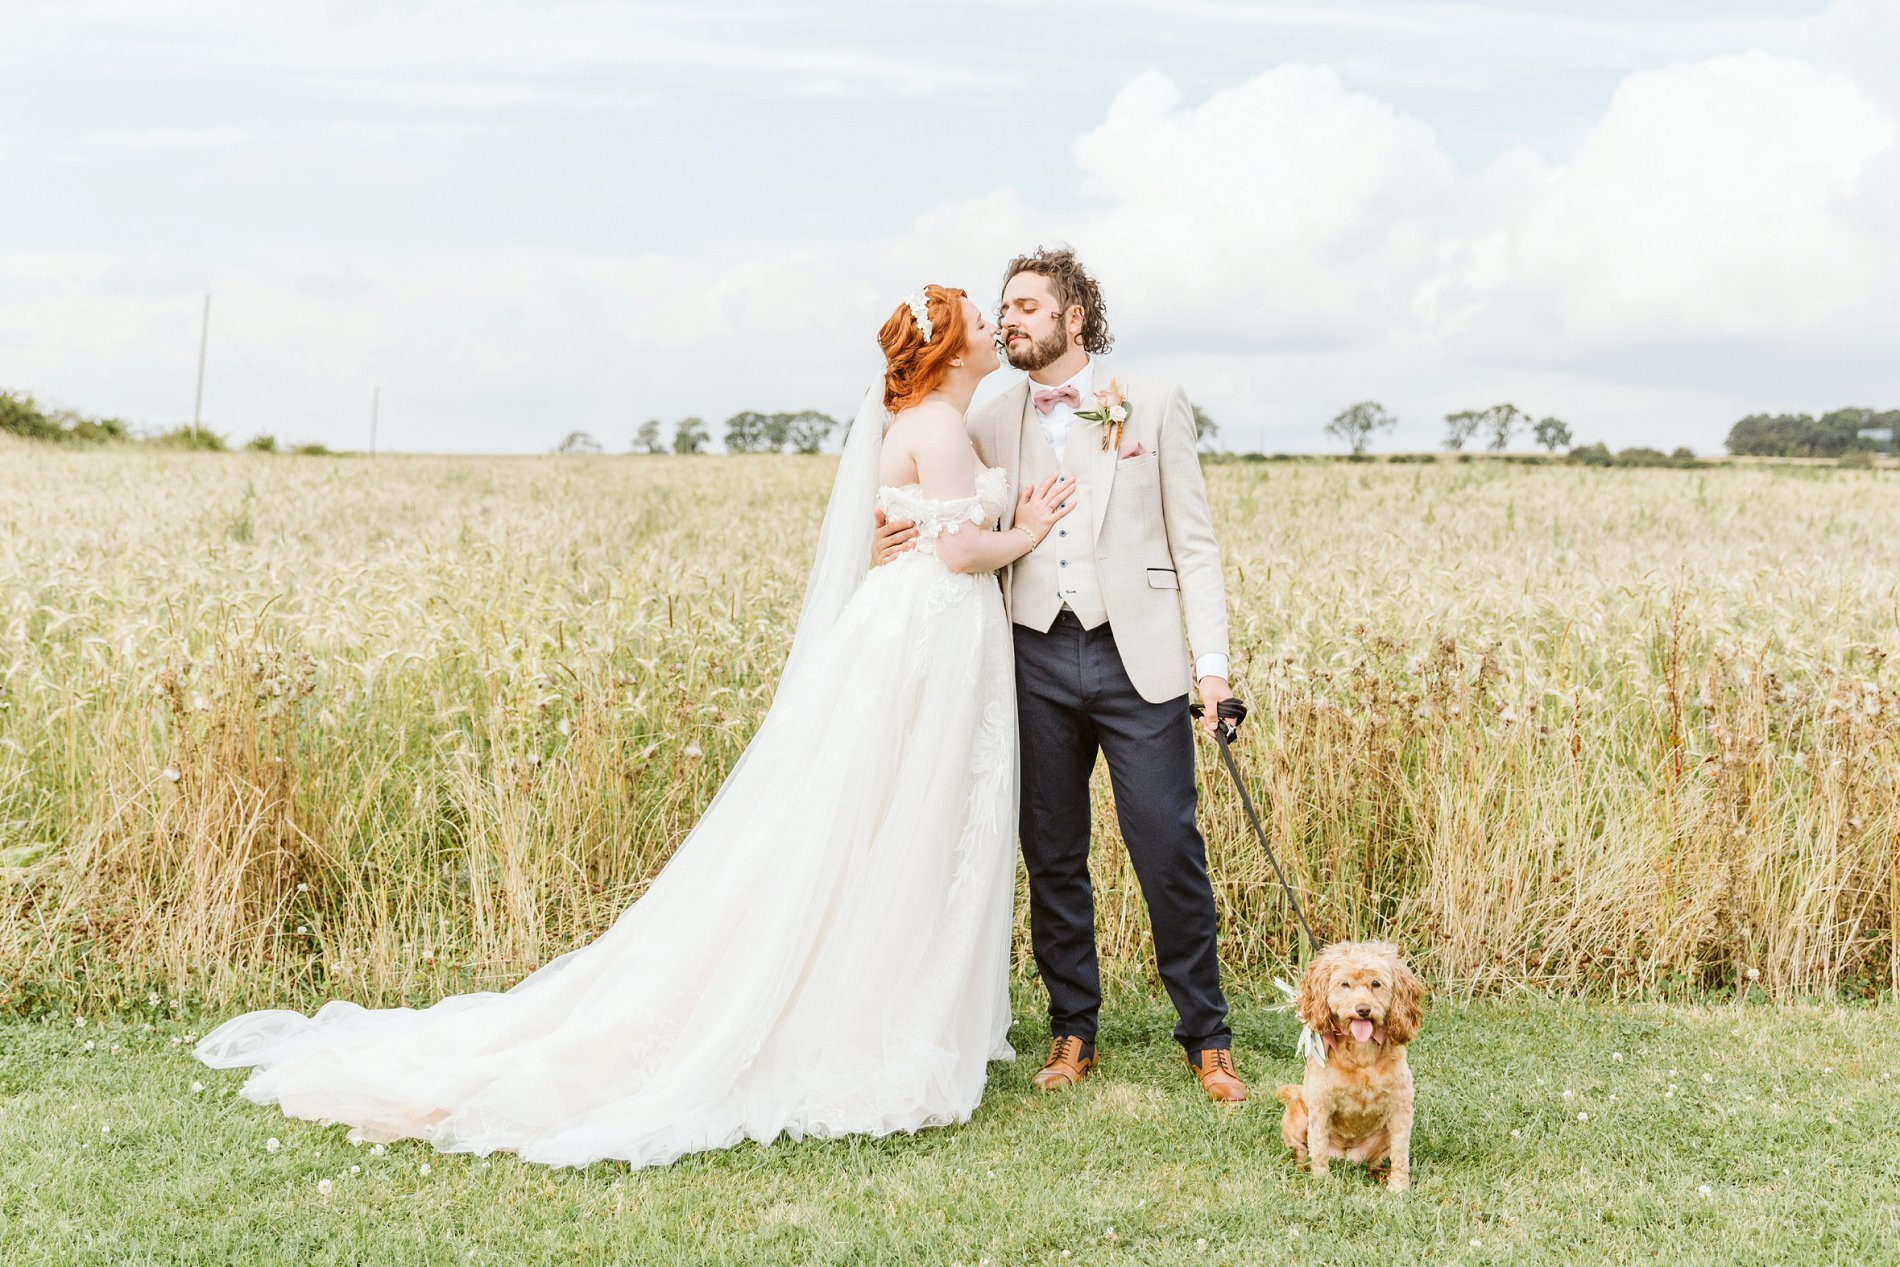 Saying I Do Rustic Wedding Creative Shoot (c) Charlotte Eve Photography (20)